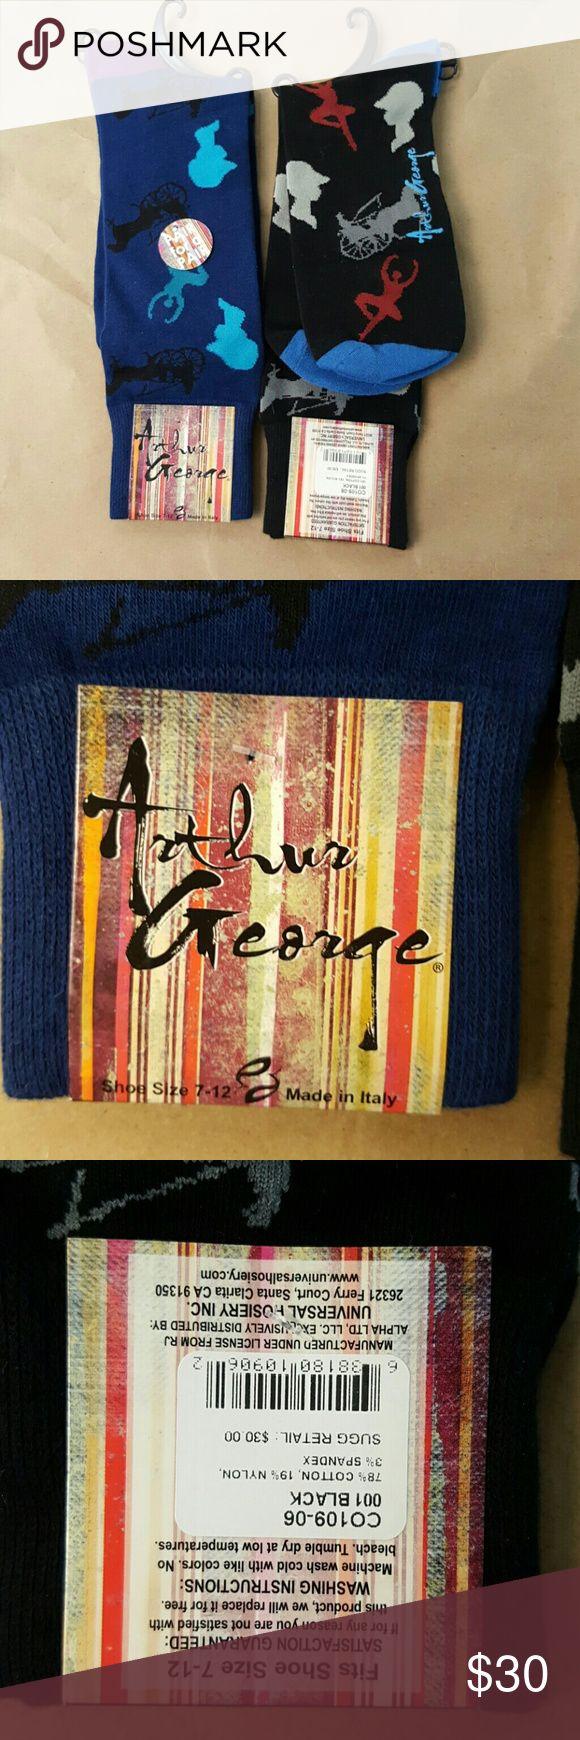 2 Pair Arthur George BalIerina Socks NWT 2 Pair Arthur George BalIerina socks, 1 Navy Blue, 1 Black. Originally $30 pair. Arthur George Underwear & Socks Casual Socks